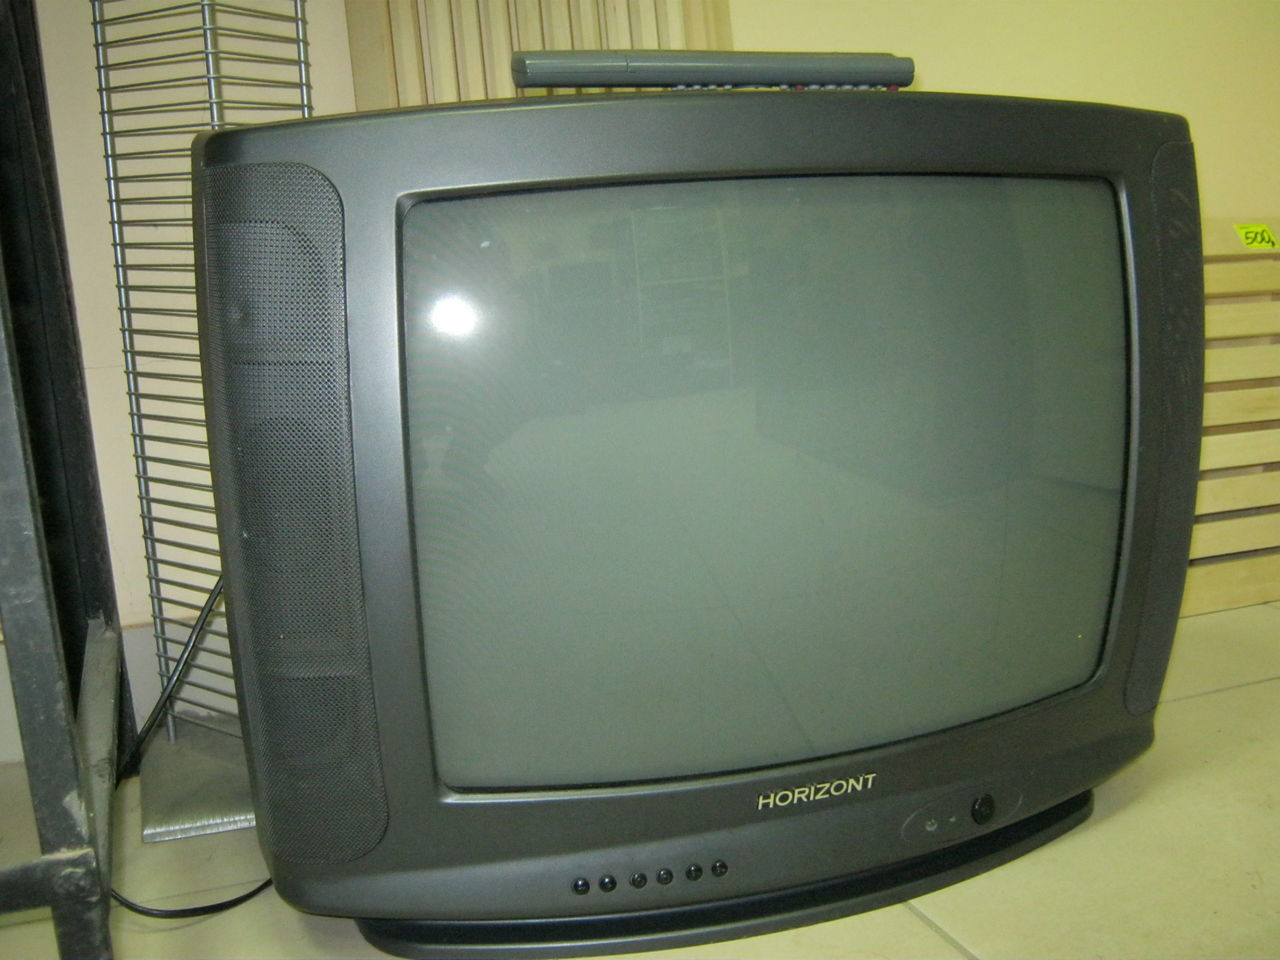 телевизор горизонт фото и модели старые нем